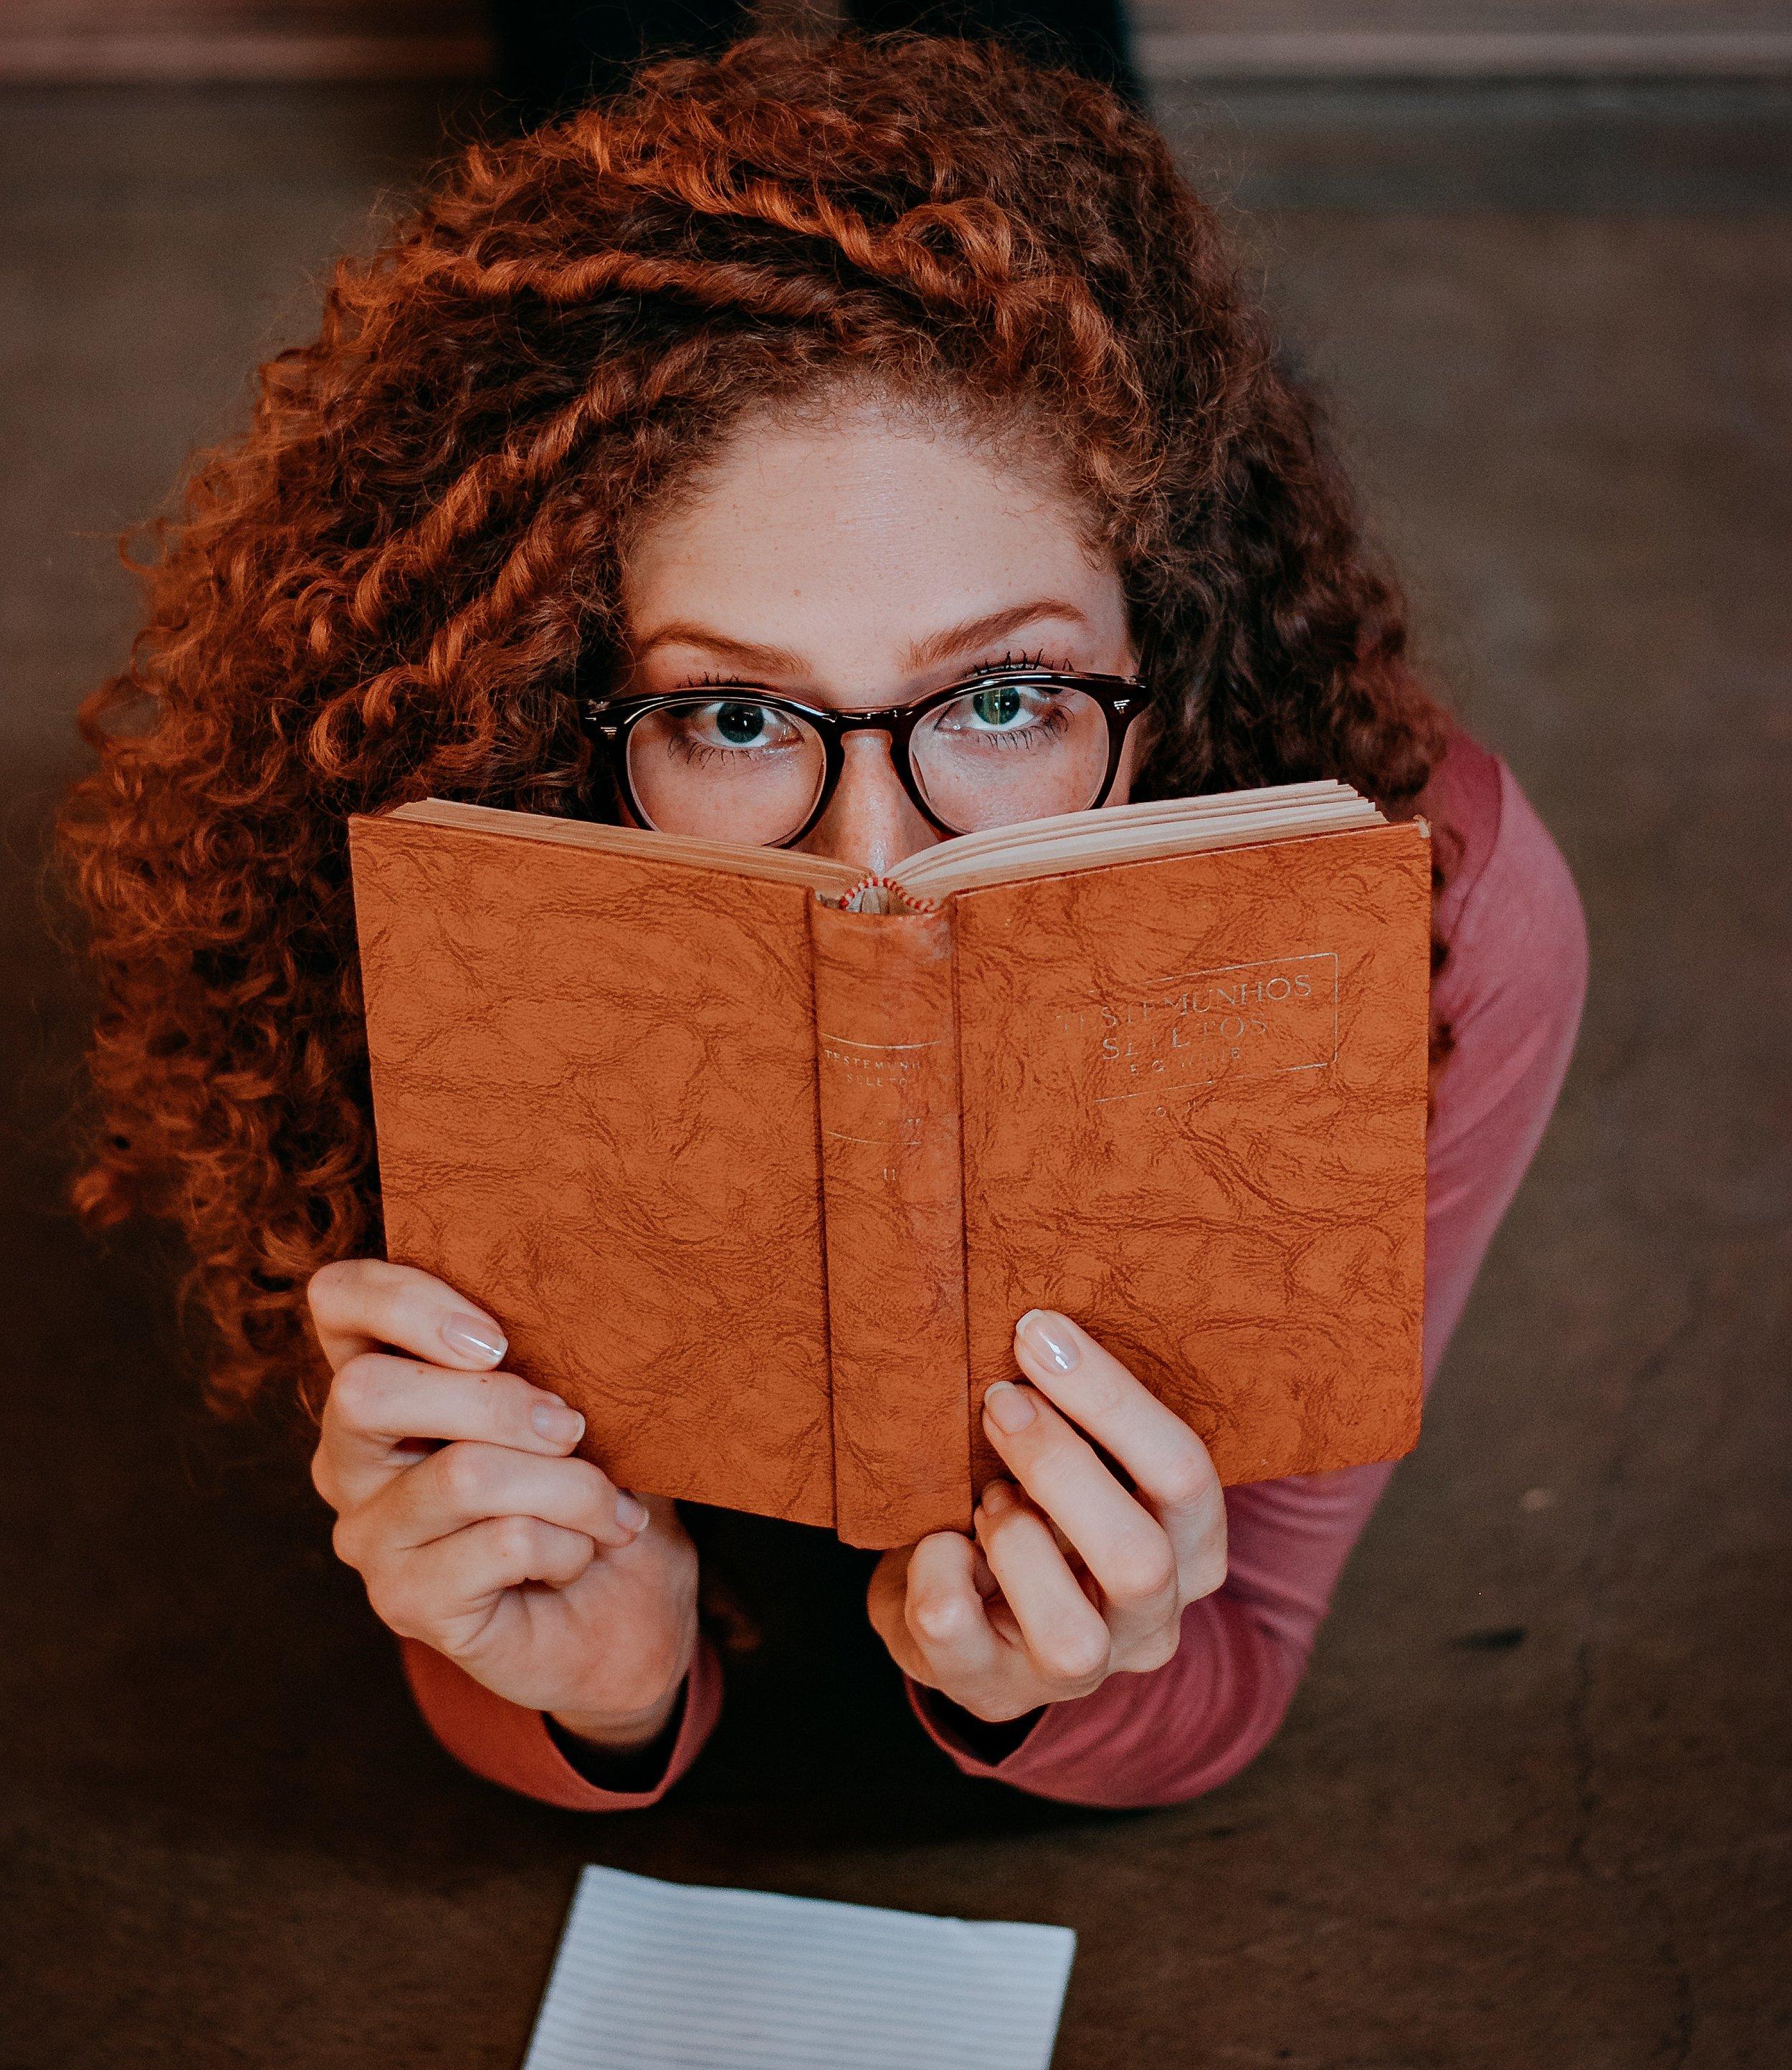 book-close-up-curly-hair-1865328.jpg